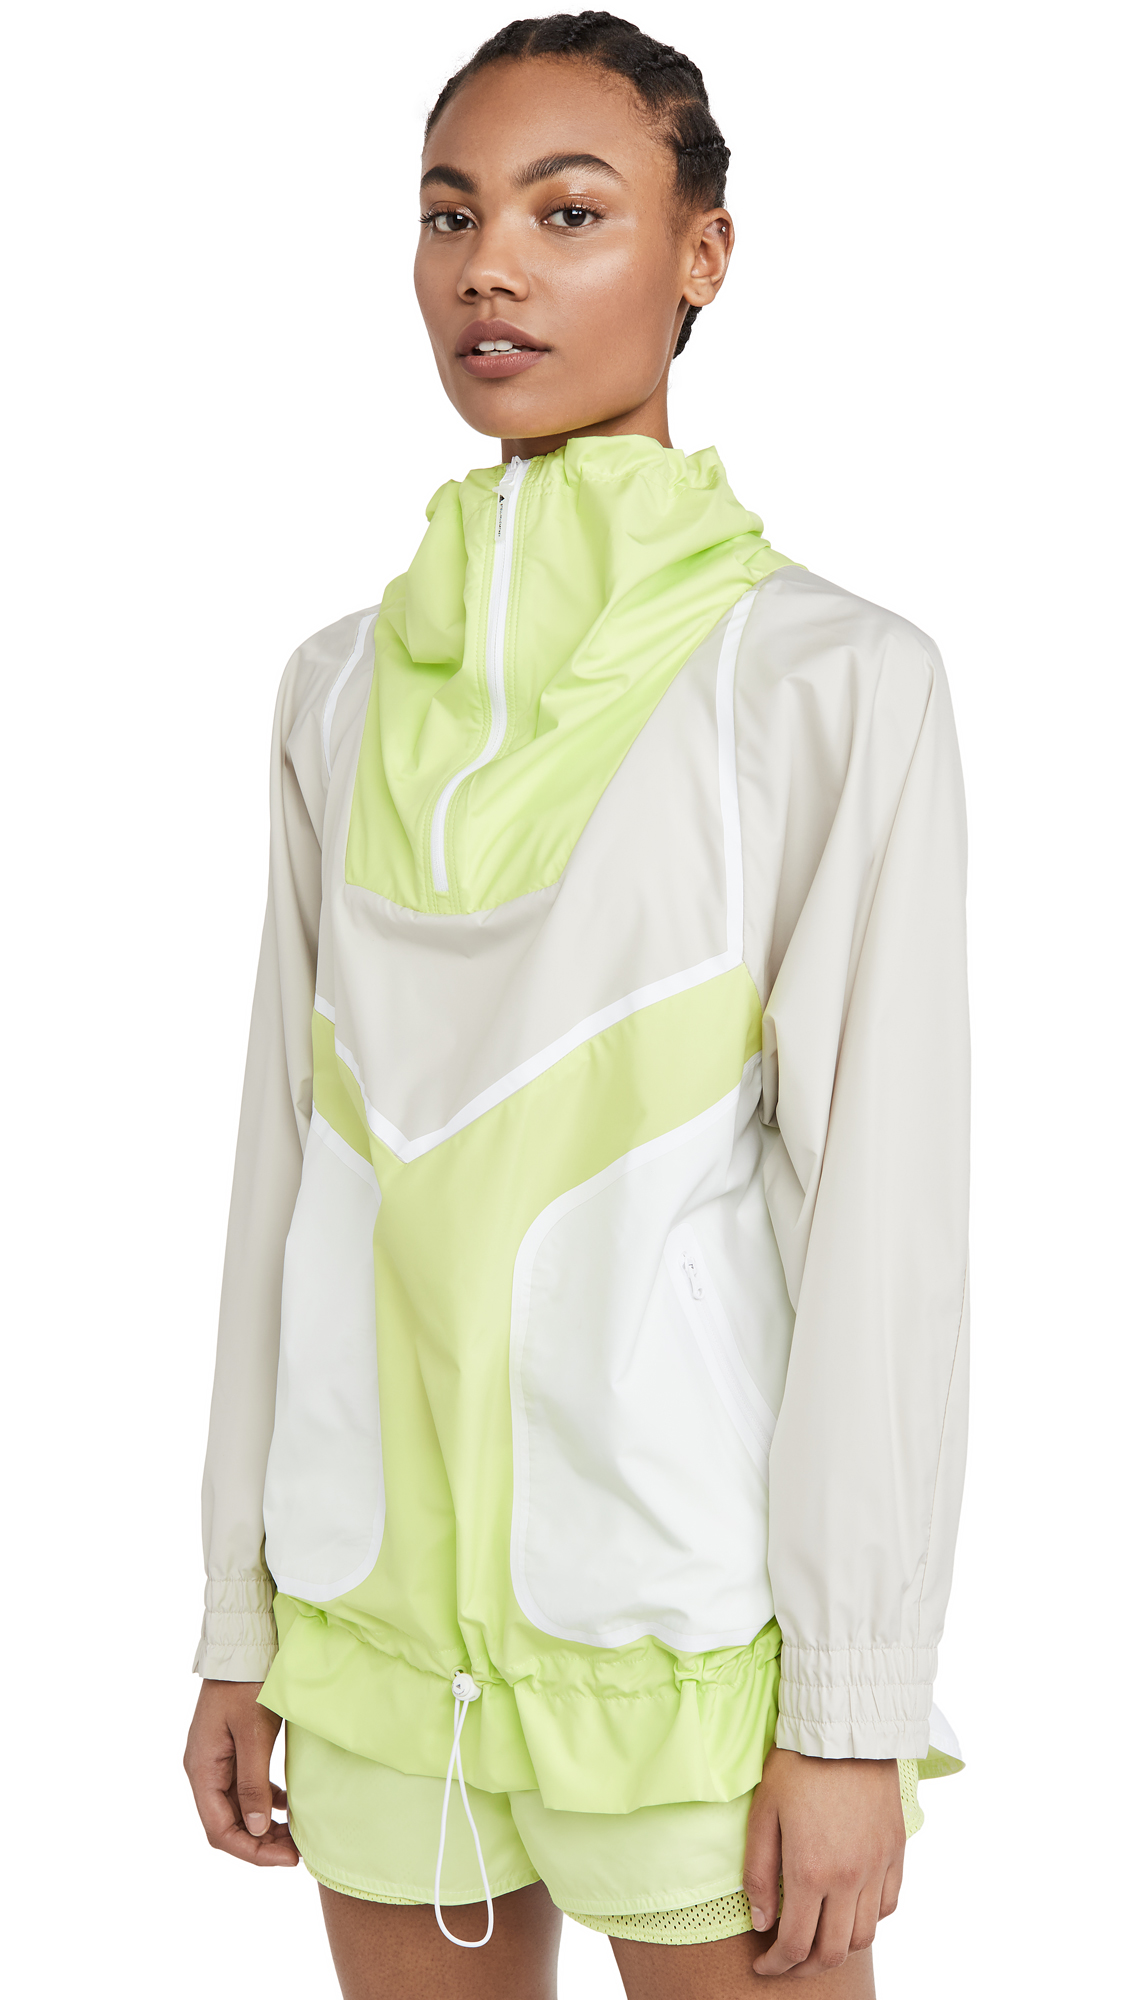 Buy adidas by Stella McCartney Lightweight Run Jacket online beautiful adidas by Stella McCartney Jackets, Coats, Coats